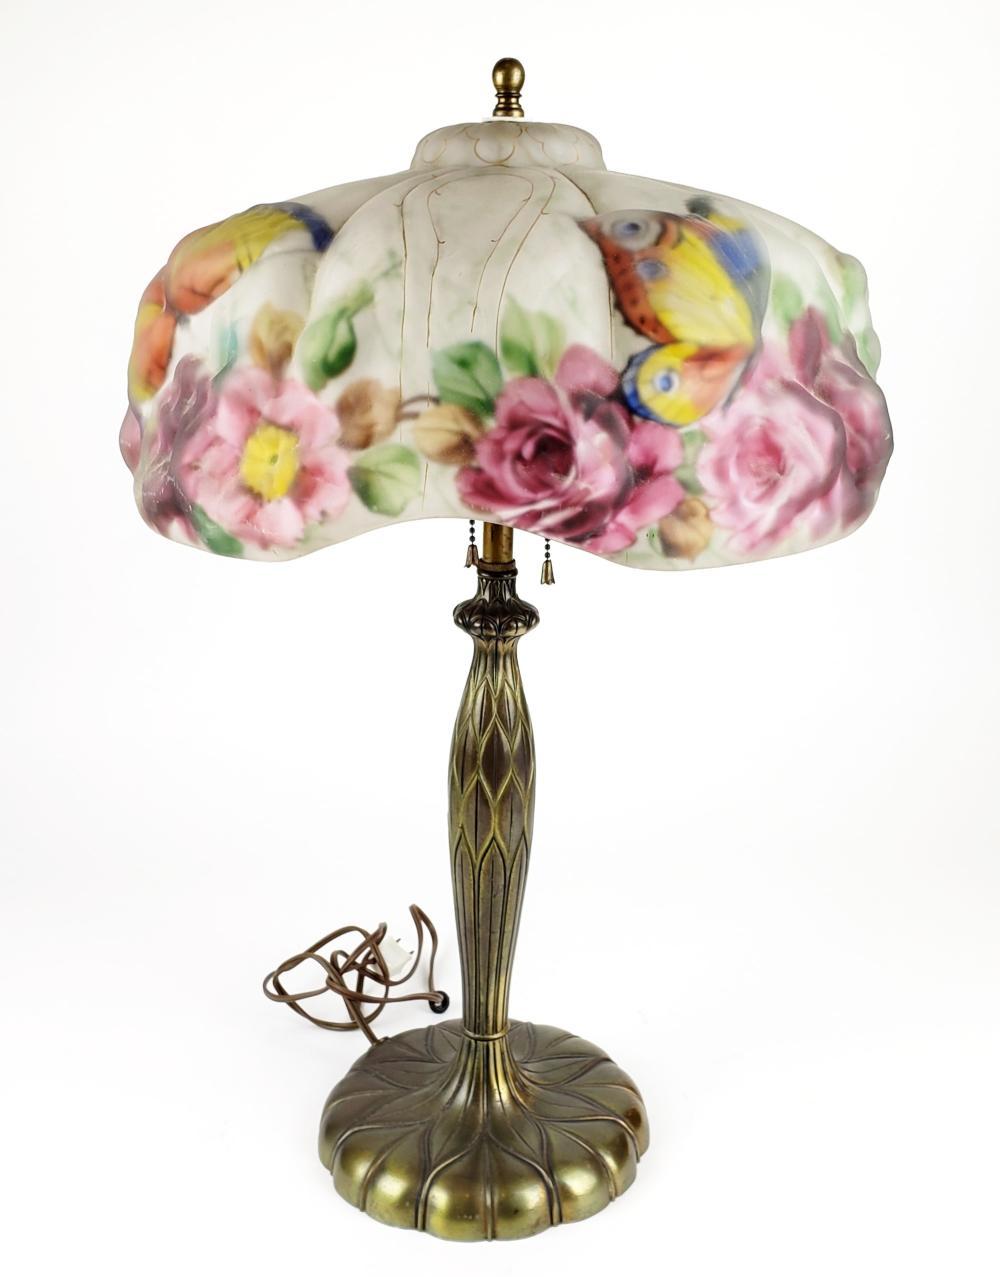 Magnificent Antique Pairpoint Lamp